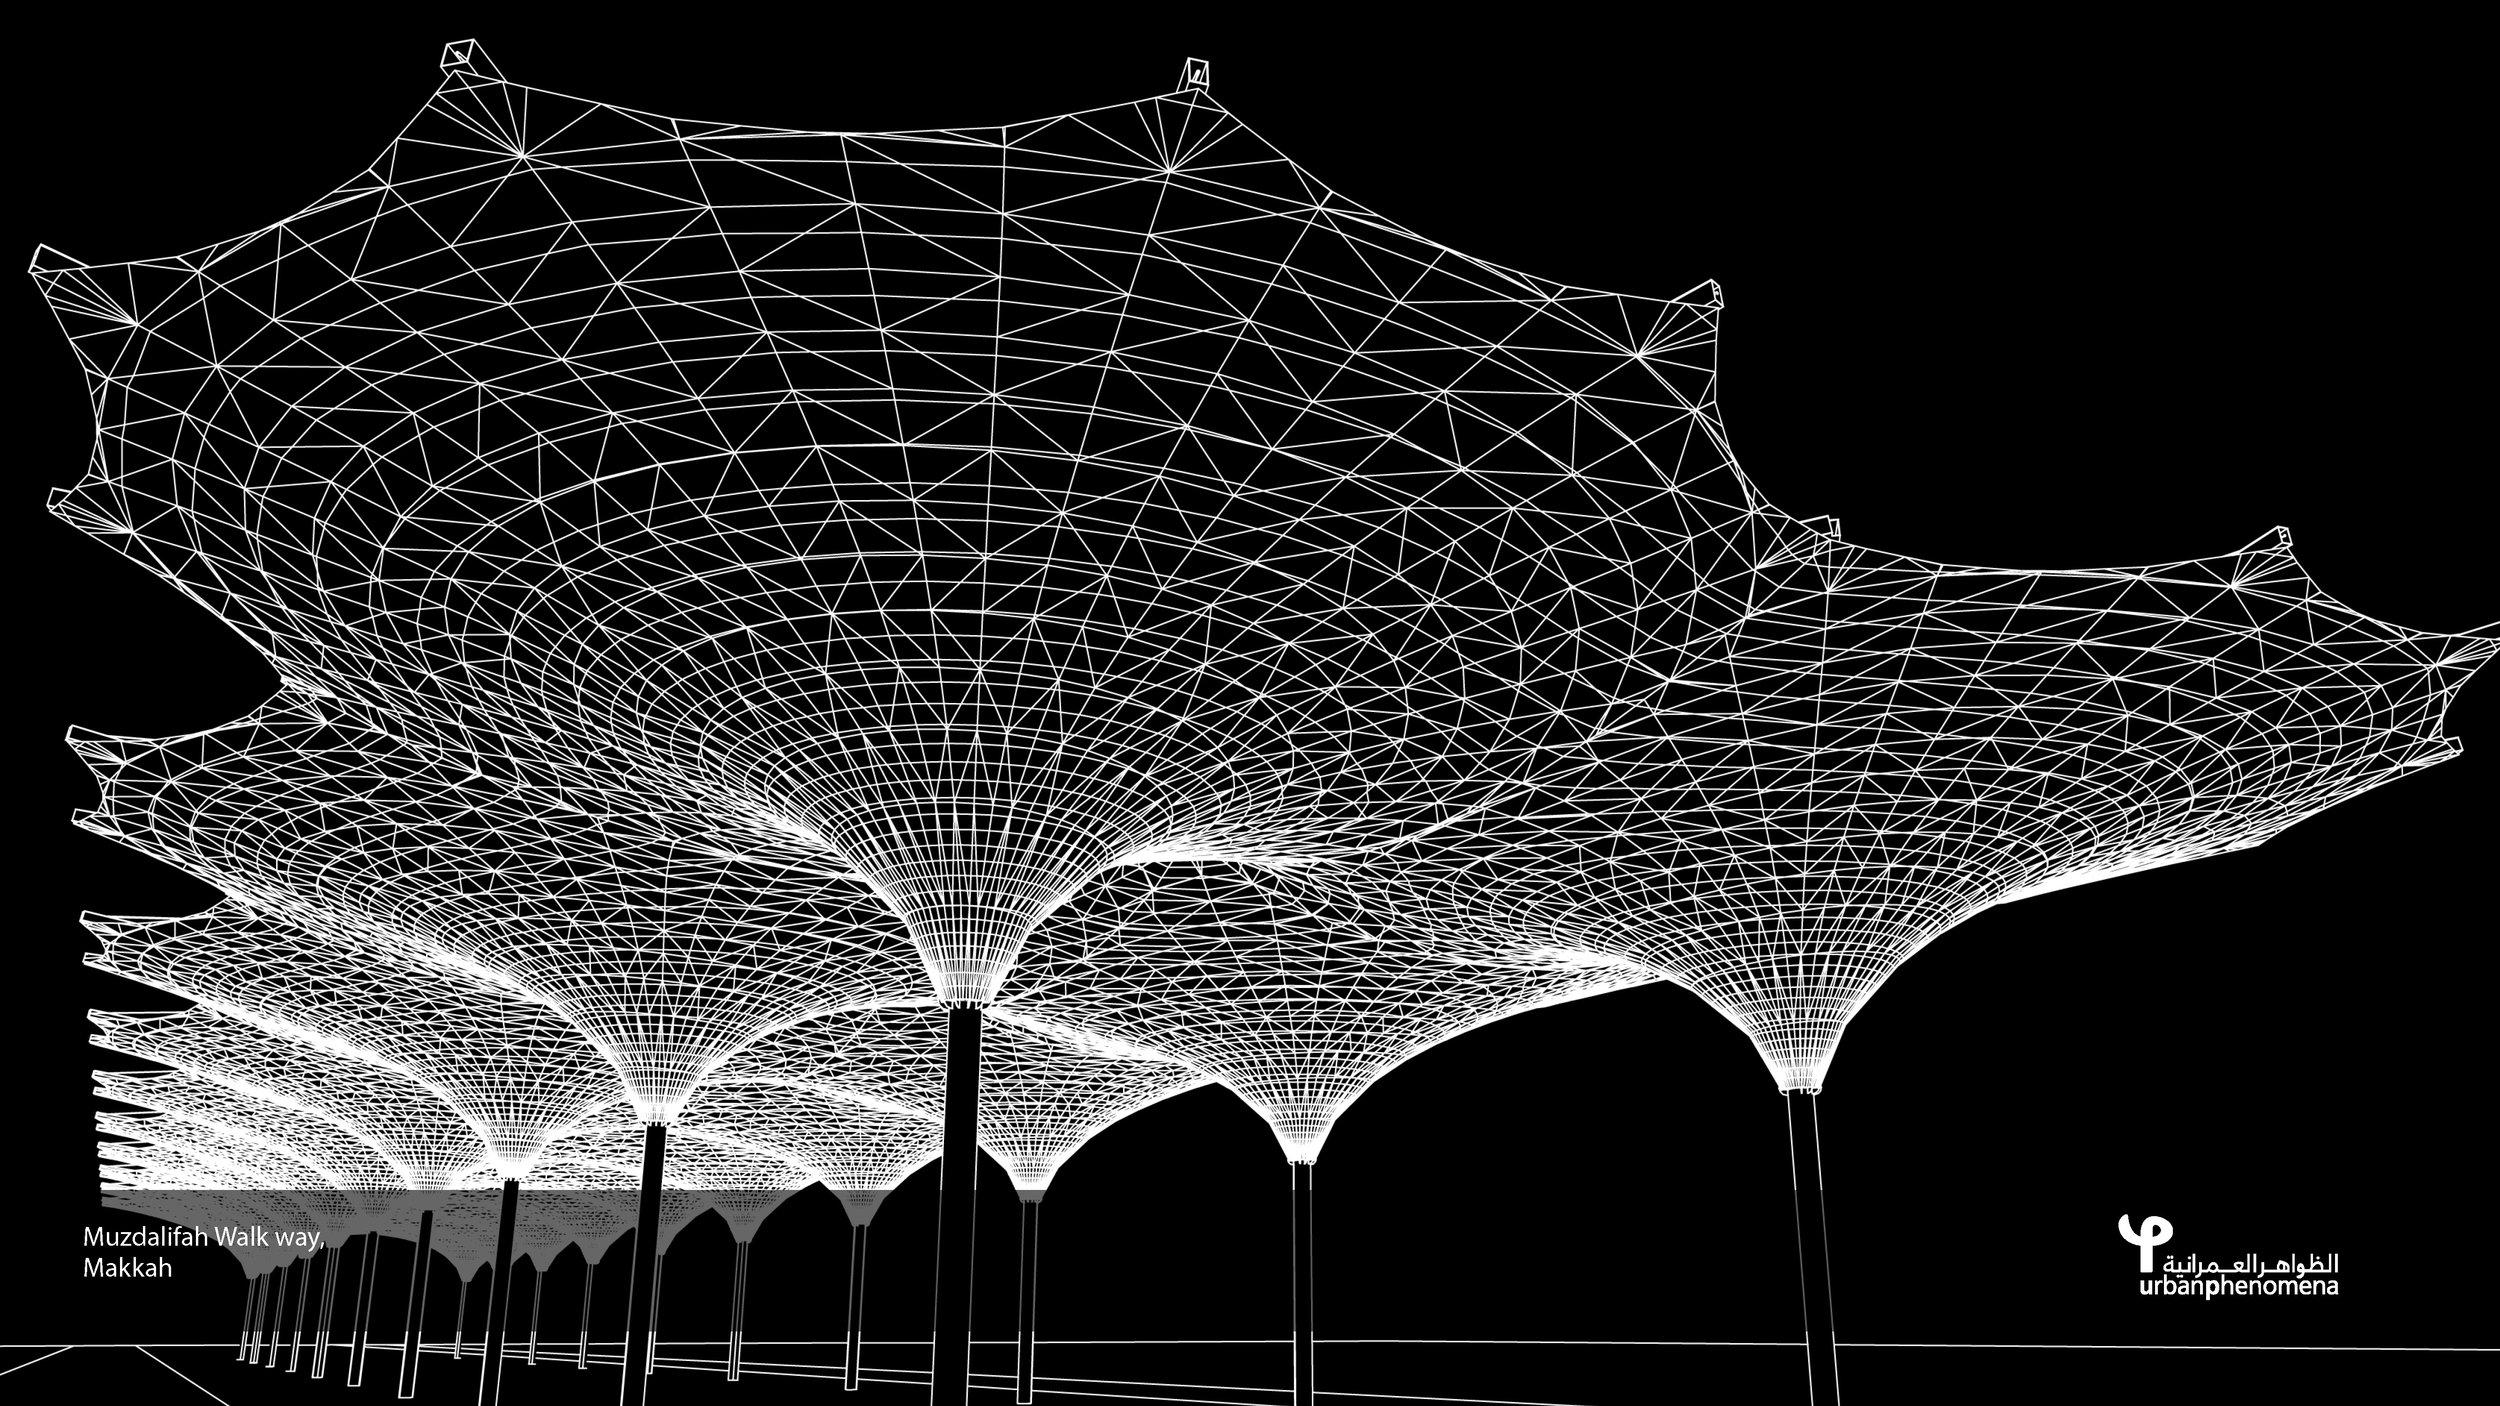 Lightweight structures